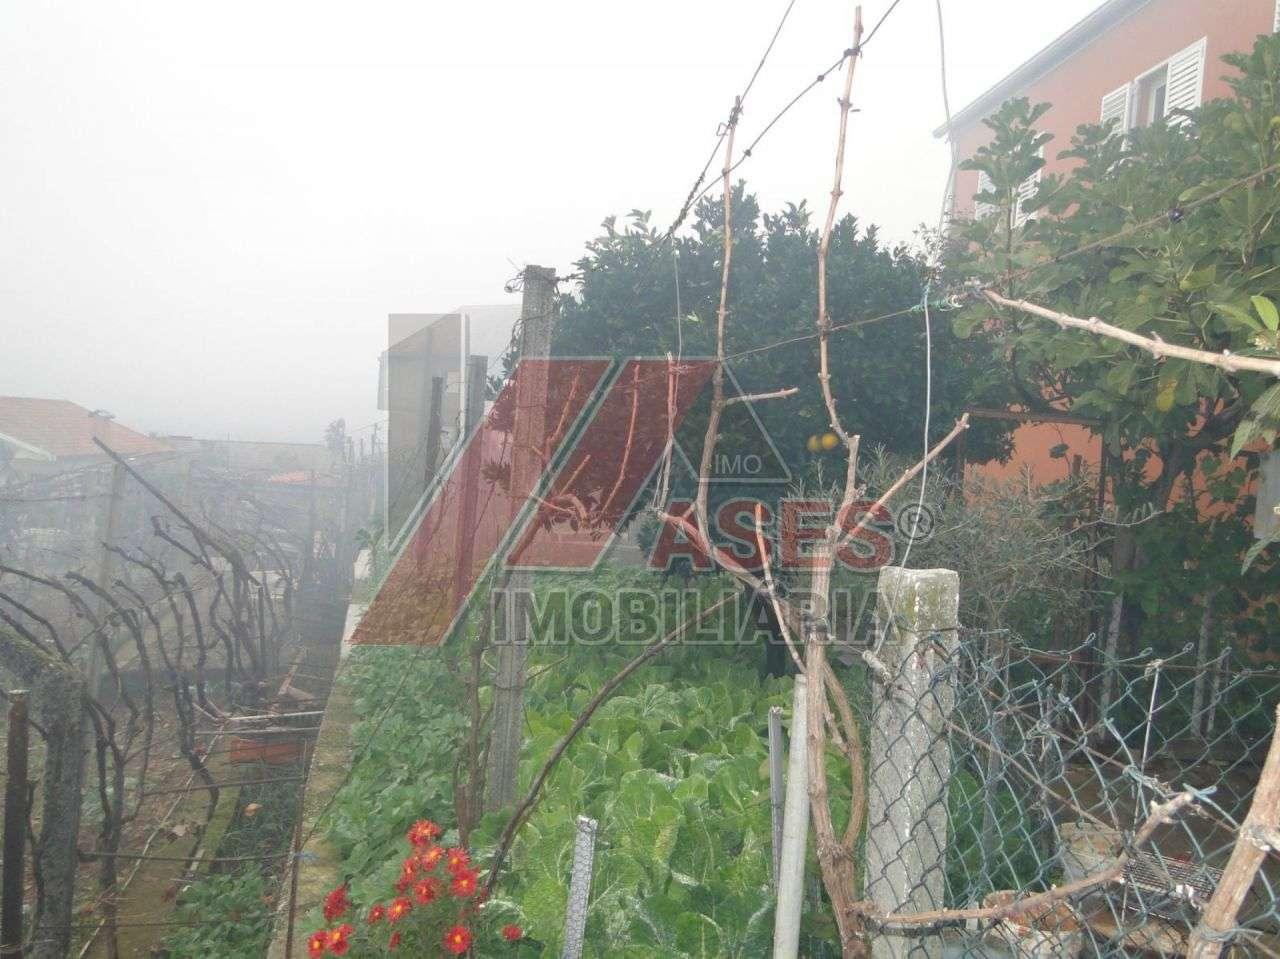 Moradia para comprar, Mondim de Basto, Vila Real - Foto 26